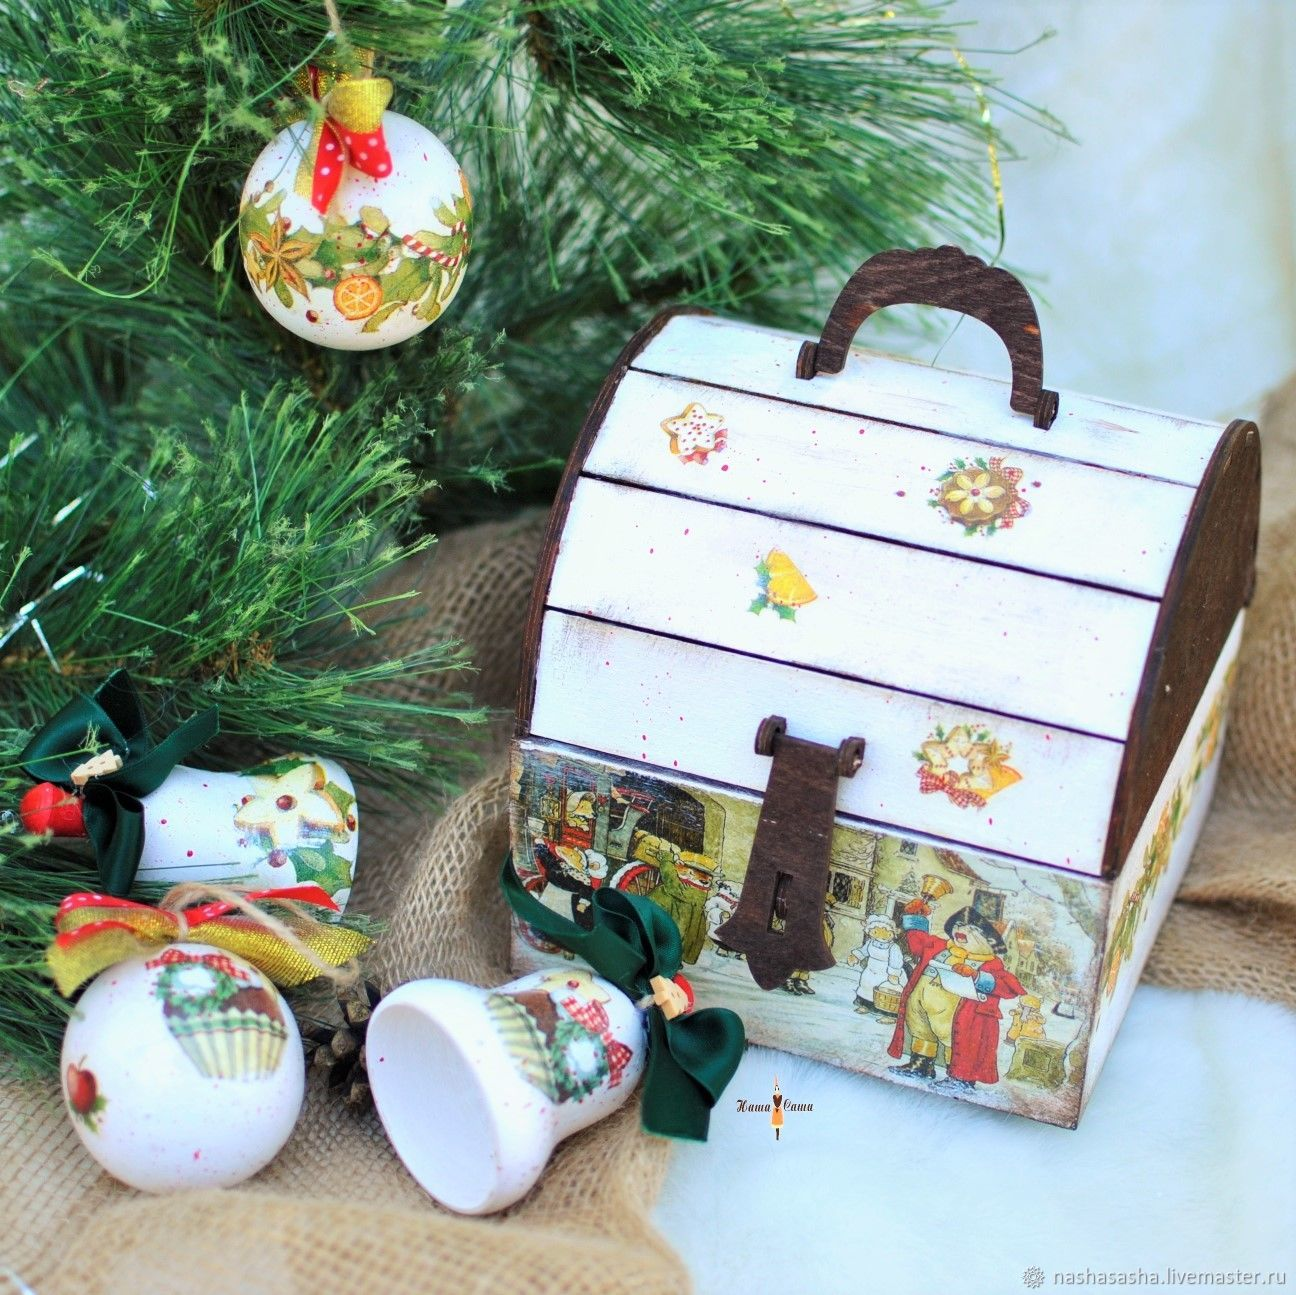 Ball jar ideas for christmas gifts